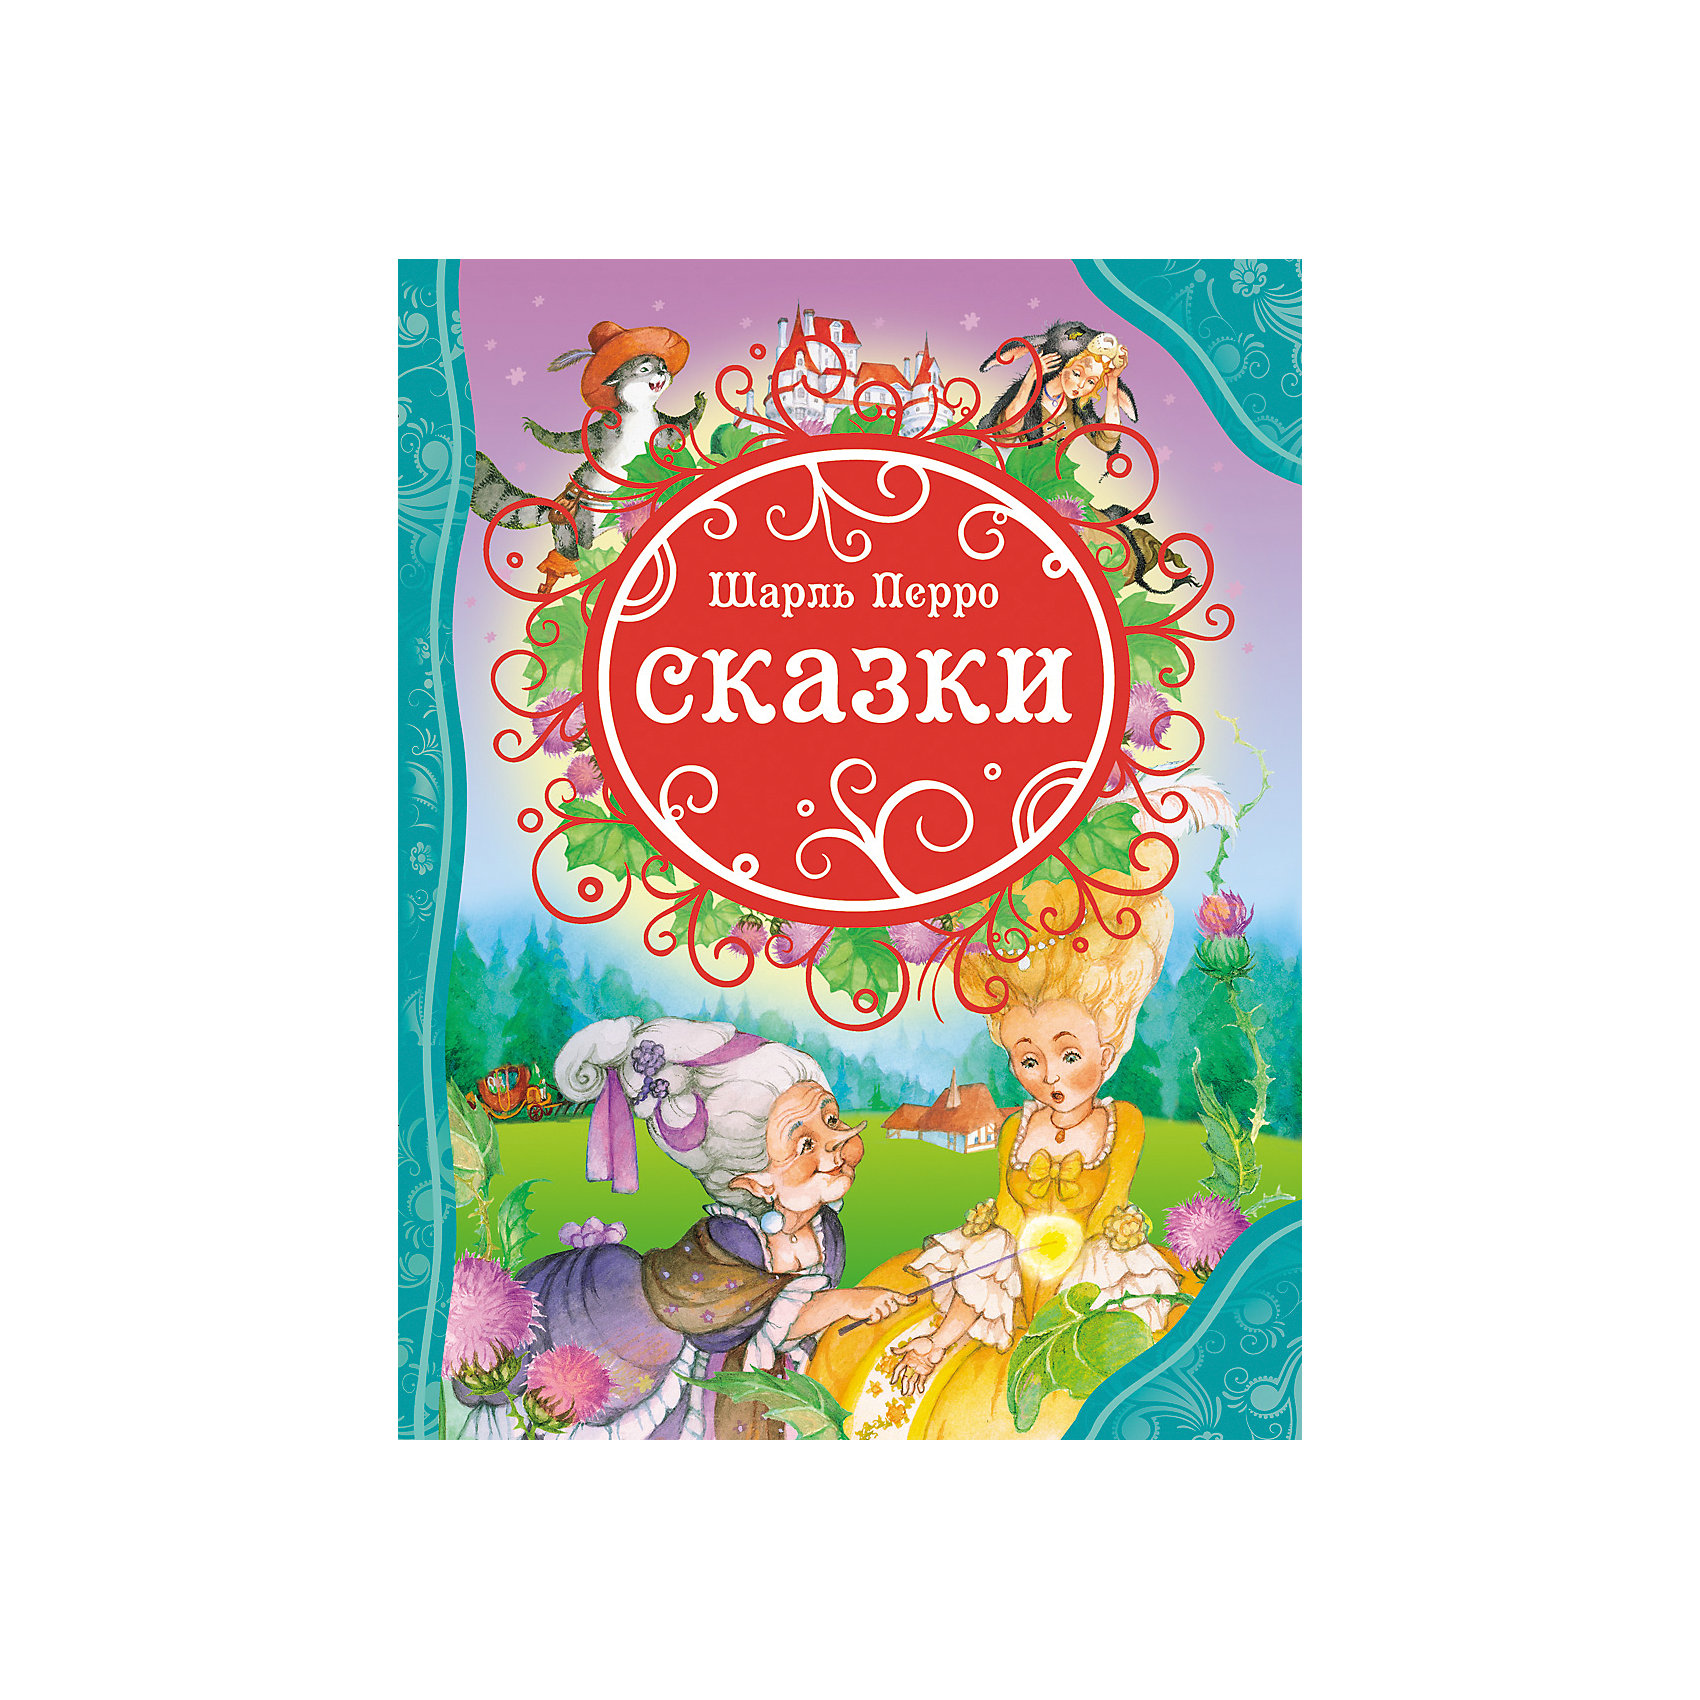 Росмэн Сказки, Ш. Перро эксмо сказки ш перро